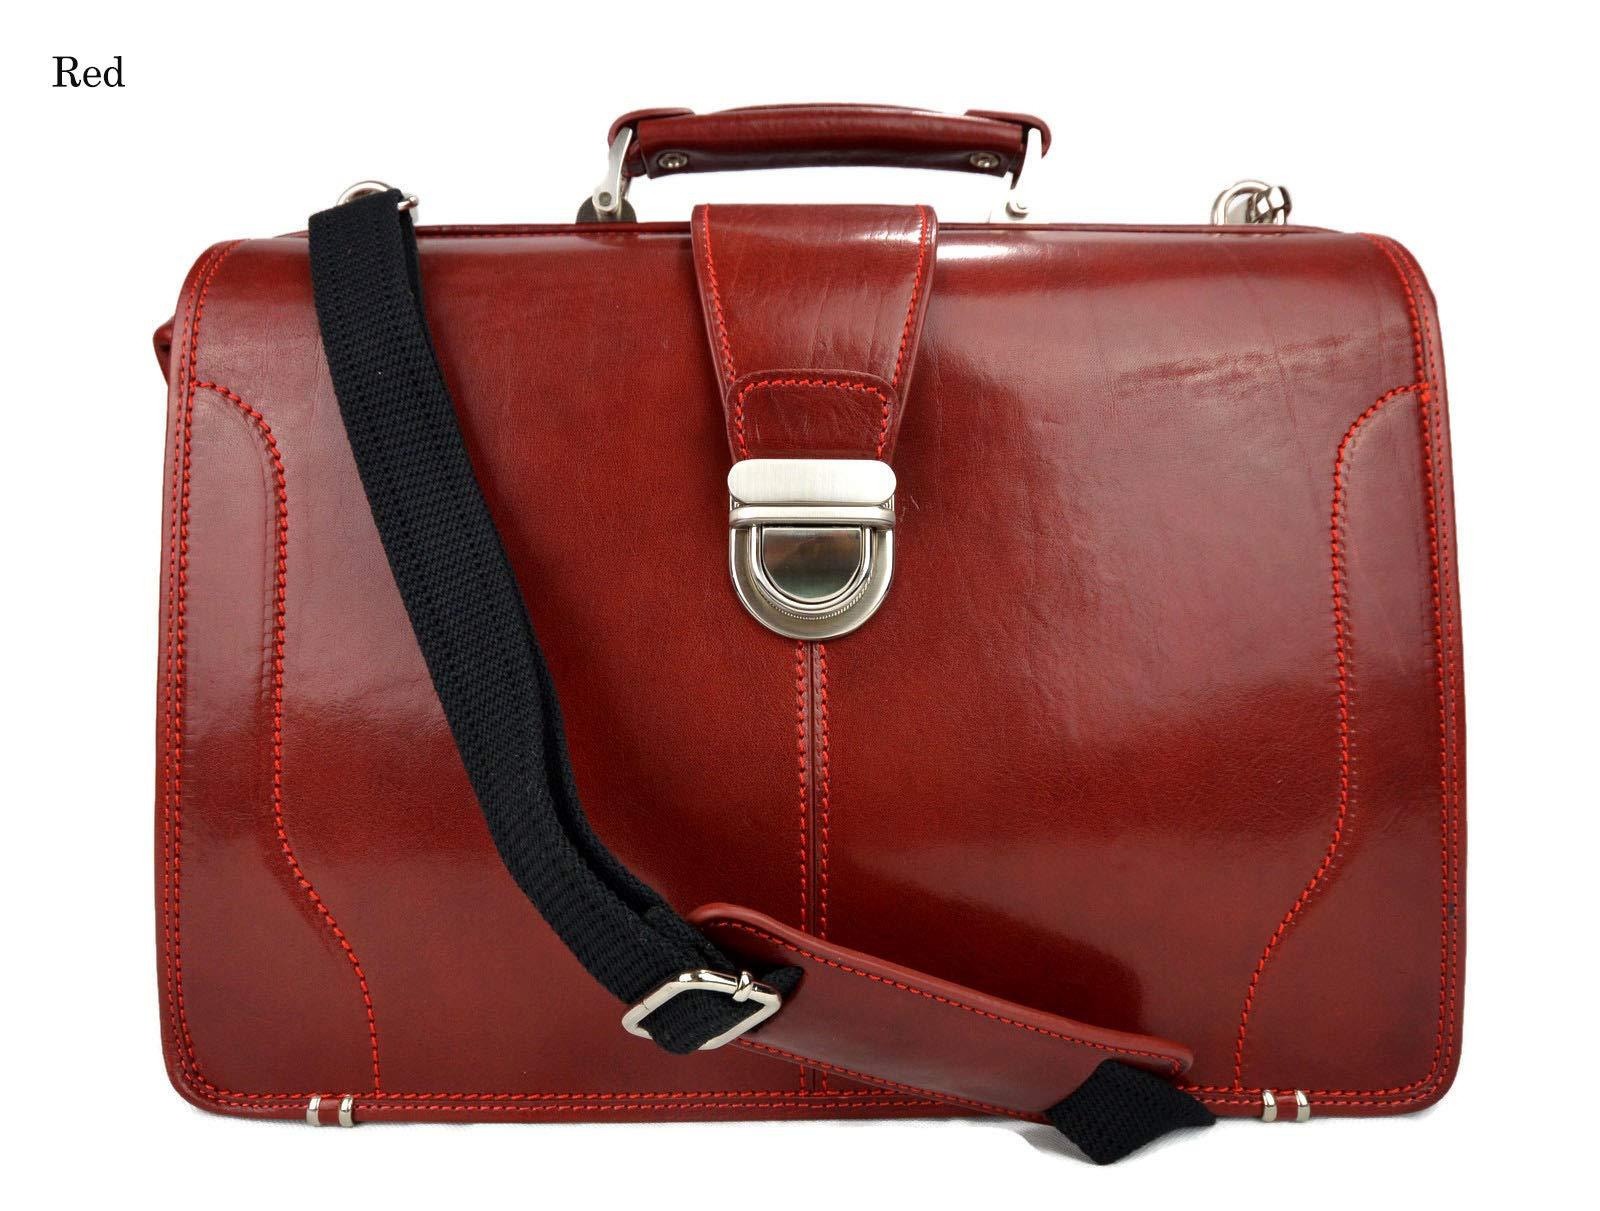 Doctor bag leather briefcase mens doctor bag XXL handbag ladies medical bag leatherbag vintage leather red made in Italy luxury bag travel weekender - handmade-bags